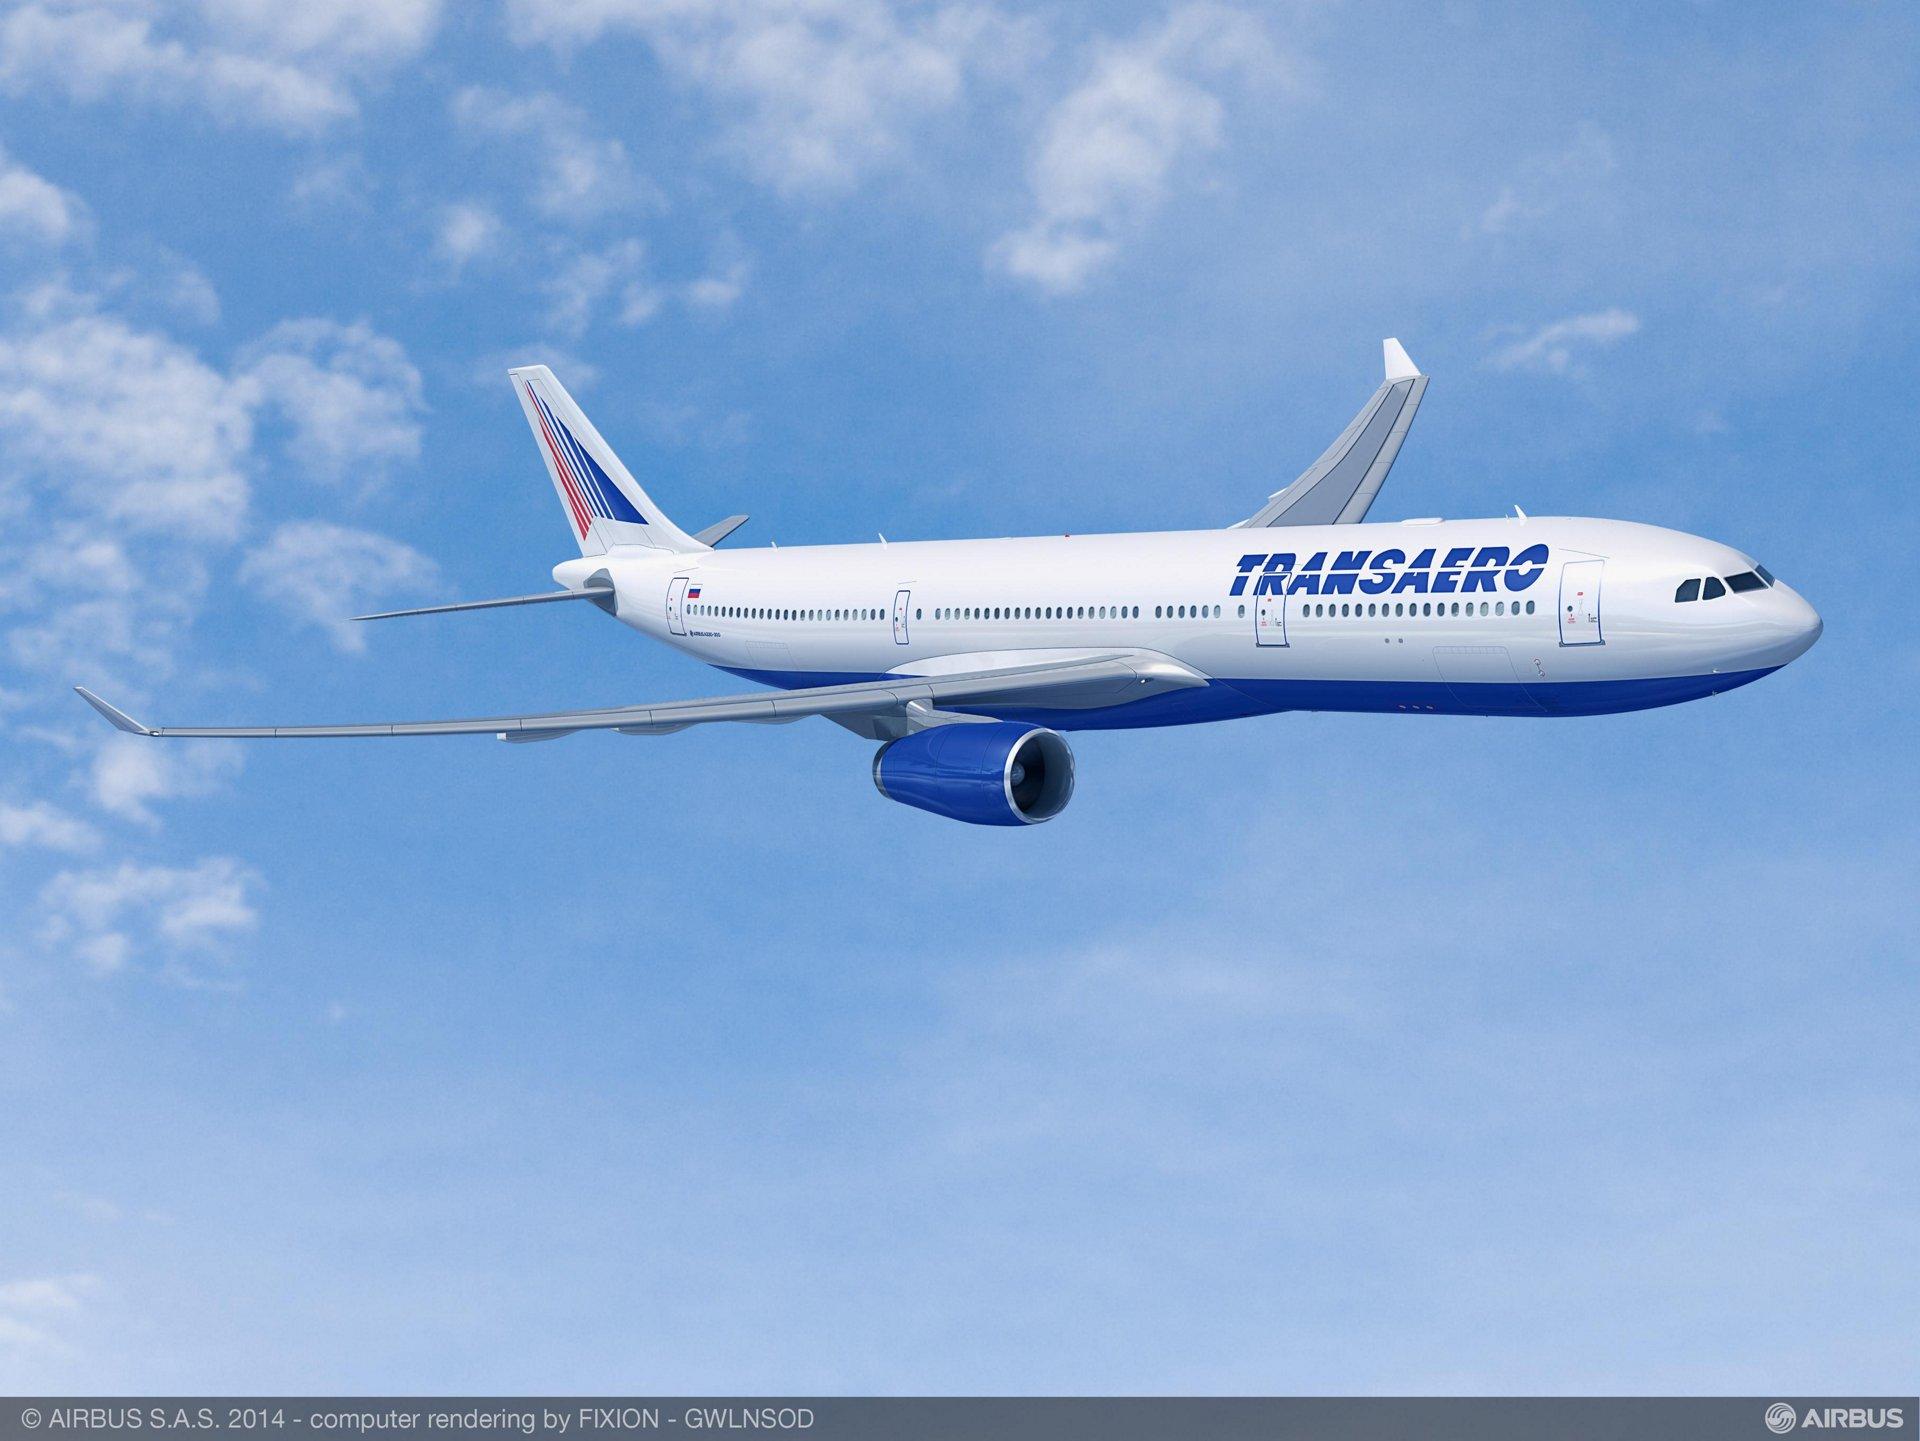 A330-300 Transaero